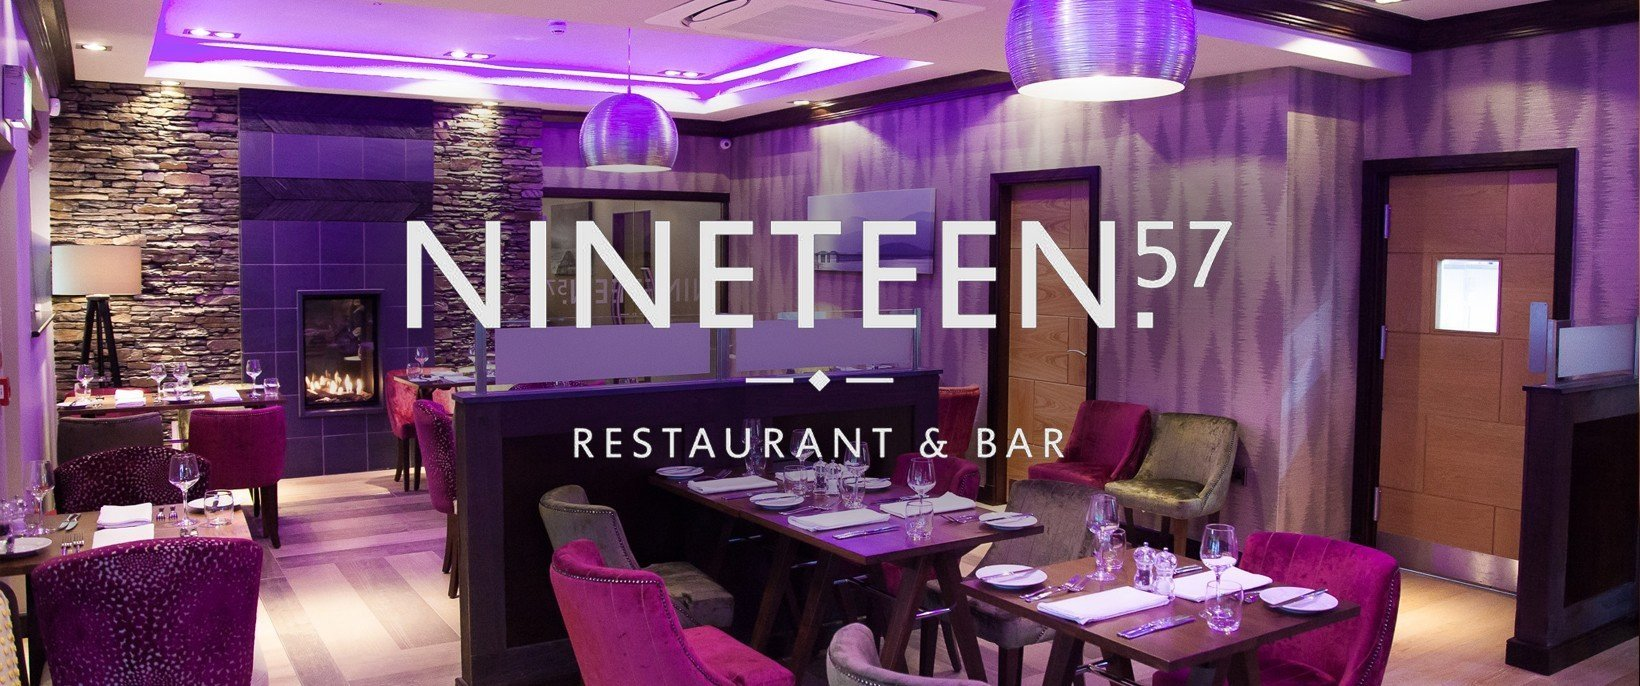 Nineteen57 Restaurant and Bar